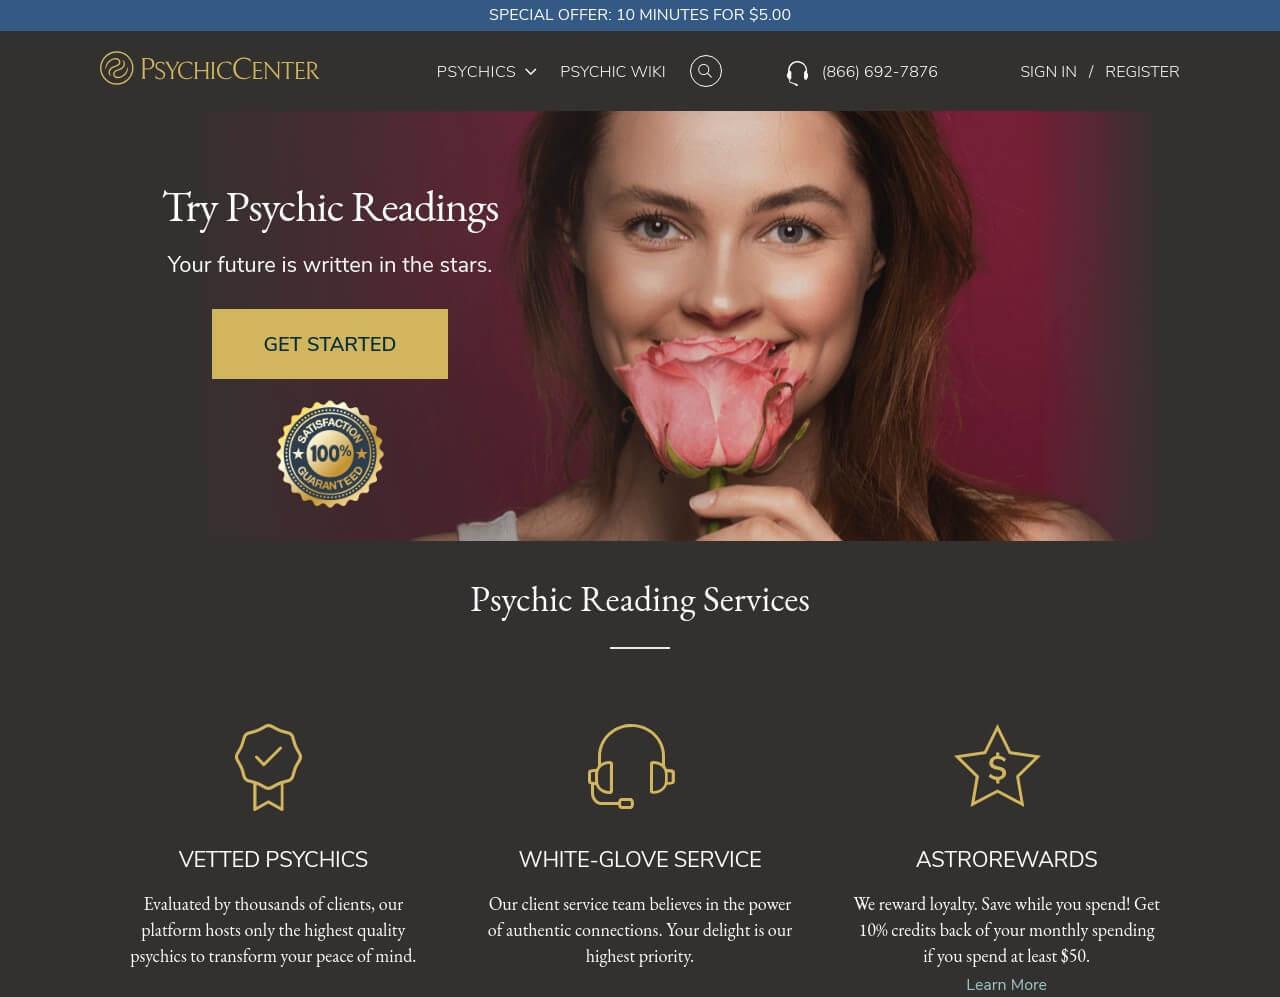 Psychic Center